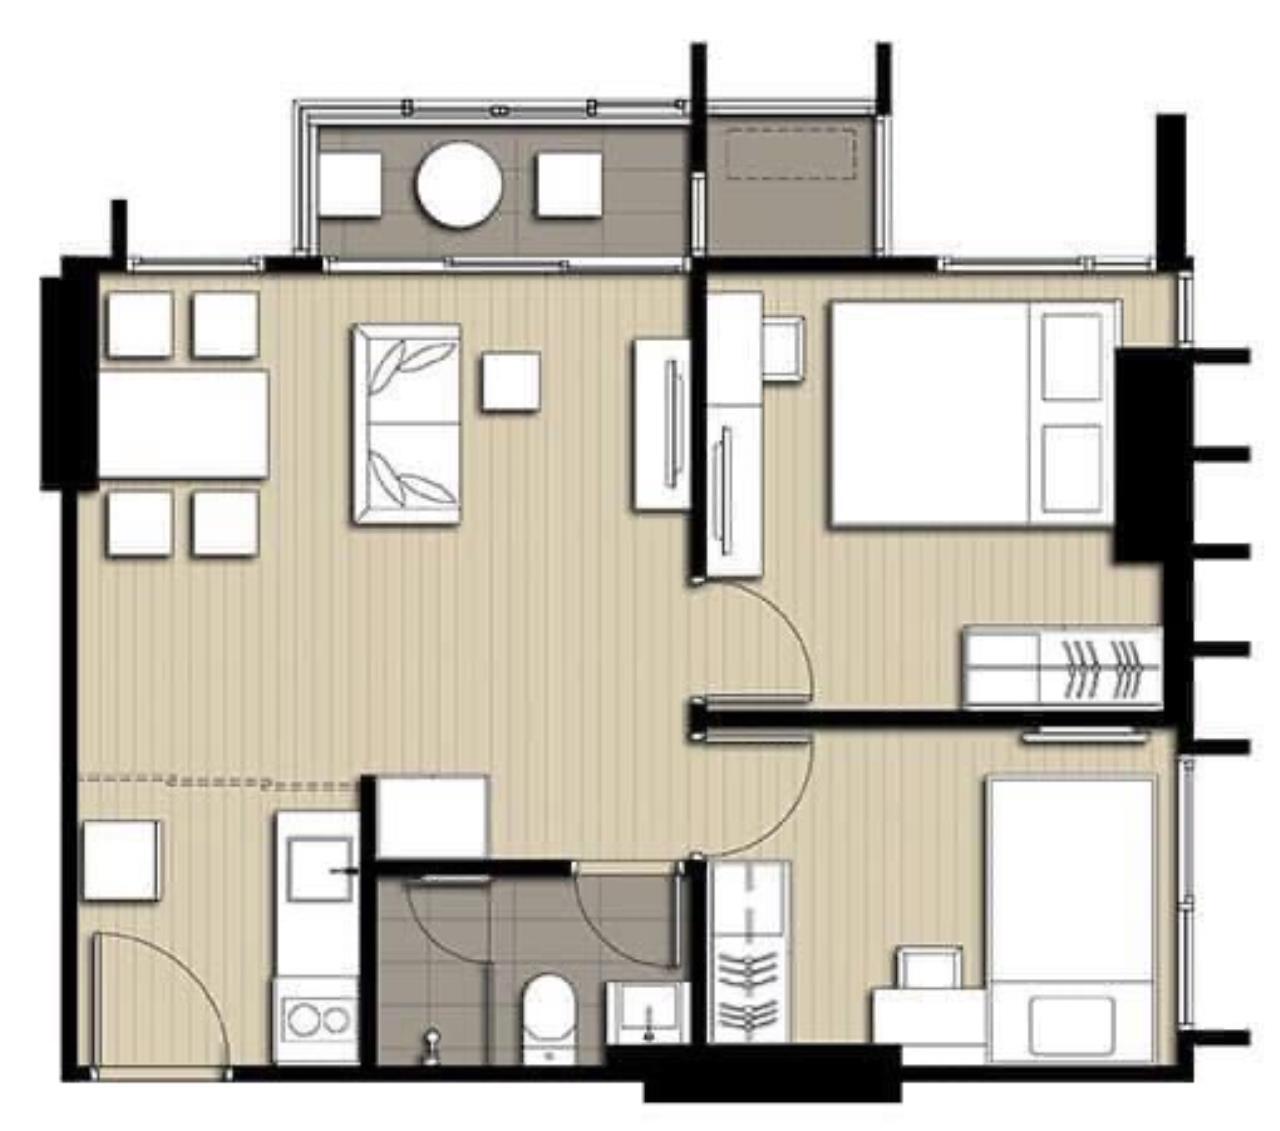 Agent - Phapayawarin Agency's Ideo Q Chula-Samyan for Sale, 2 Bedrooms 1 Bathroom, 50 Sq.m., MRT Sam Yan 10